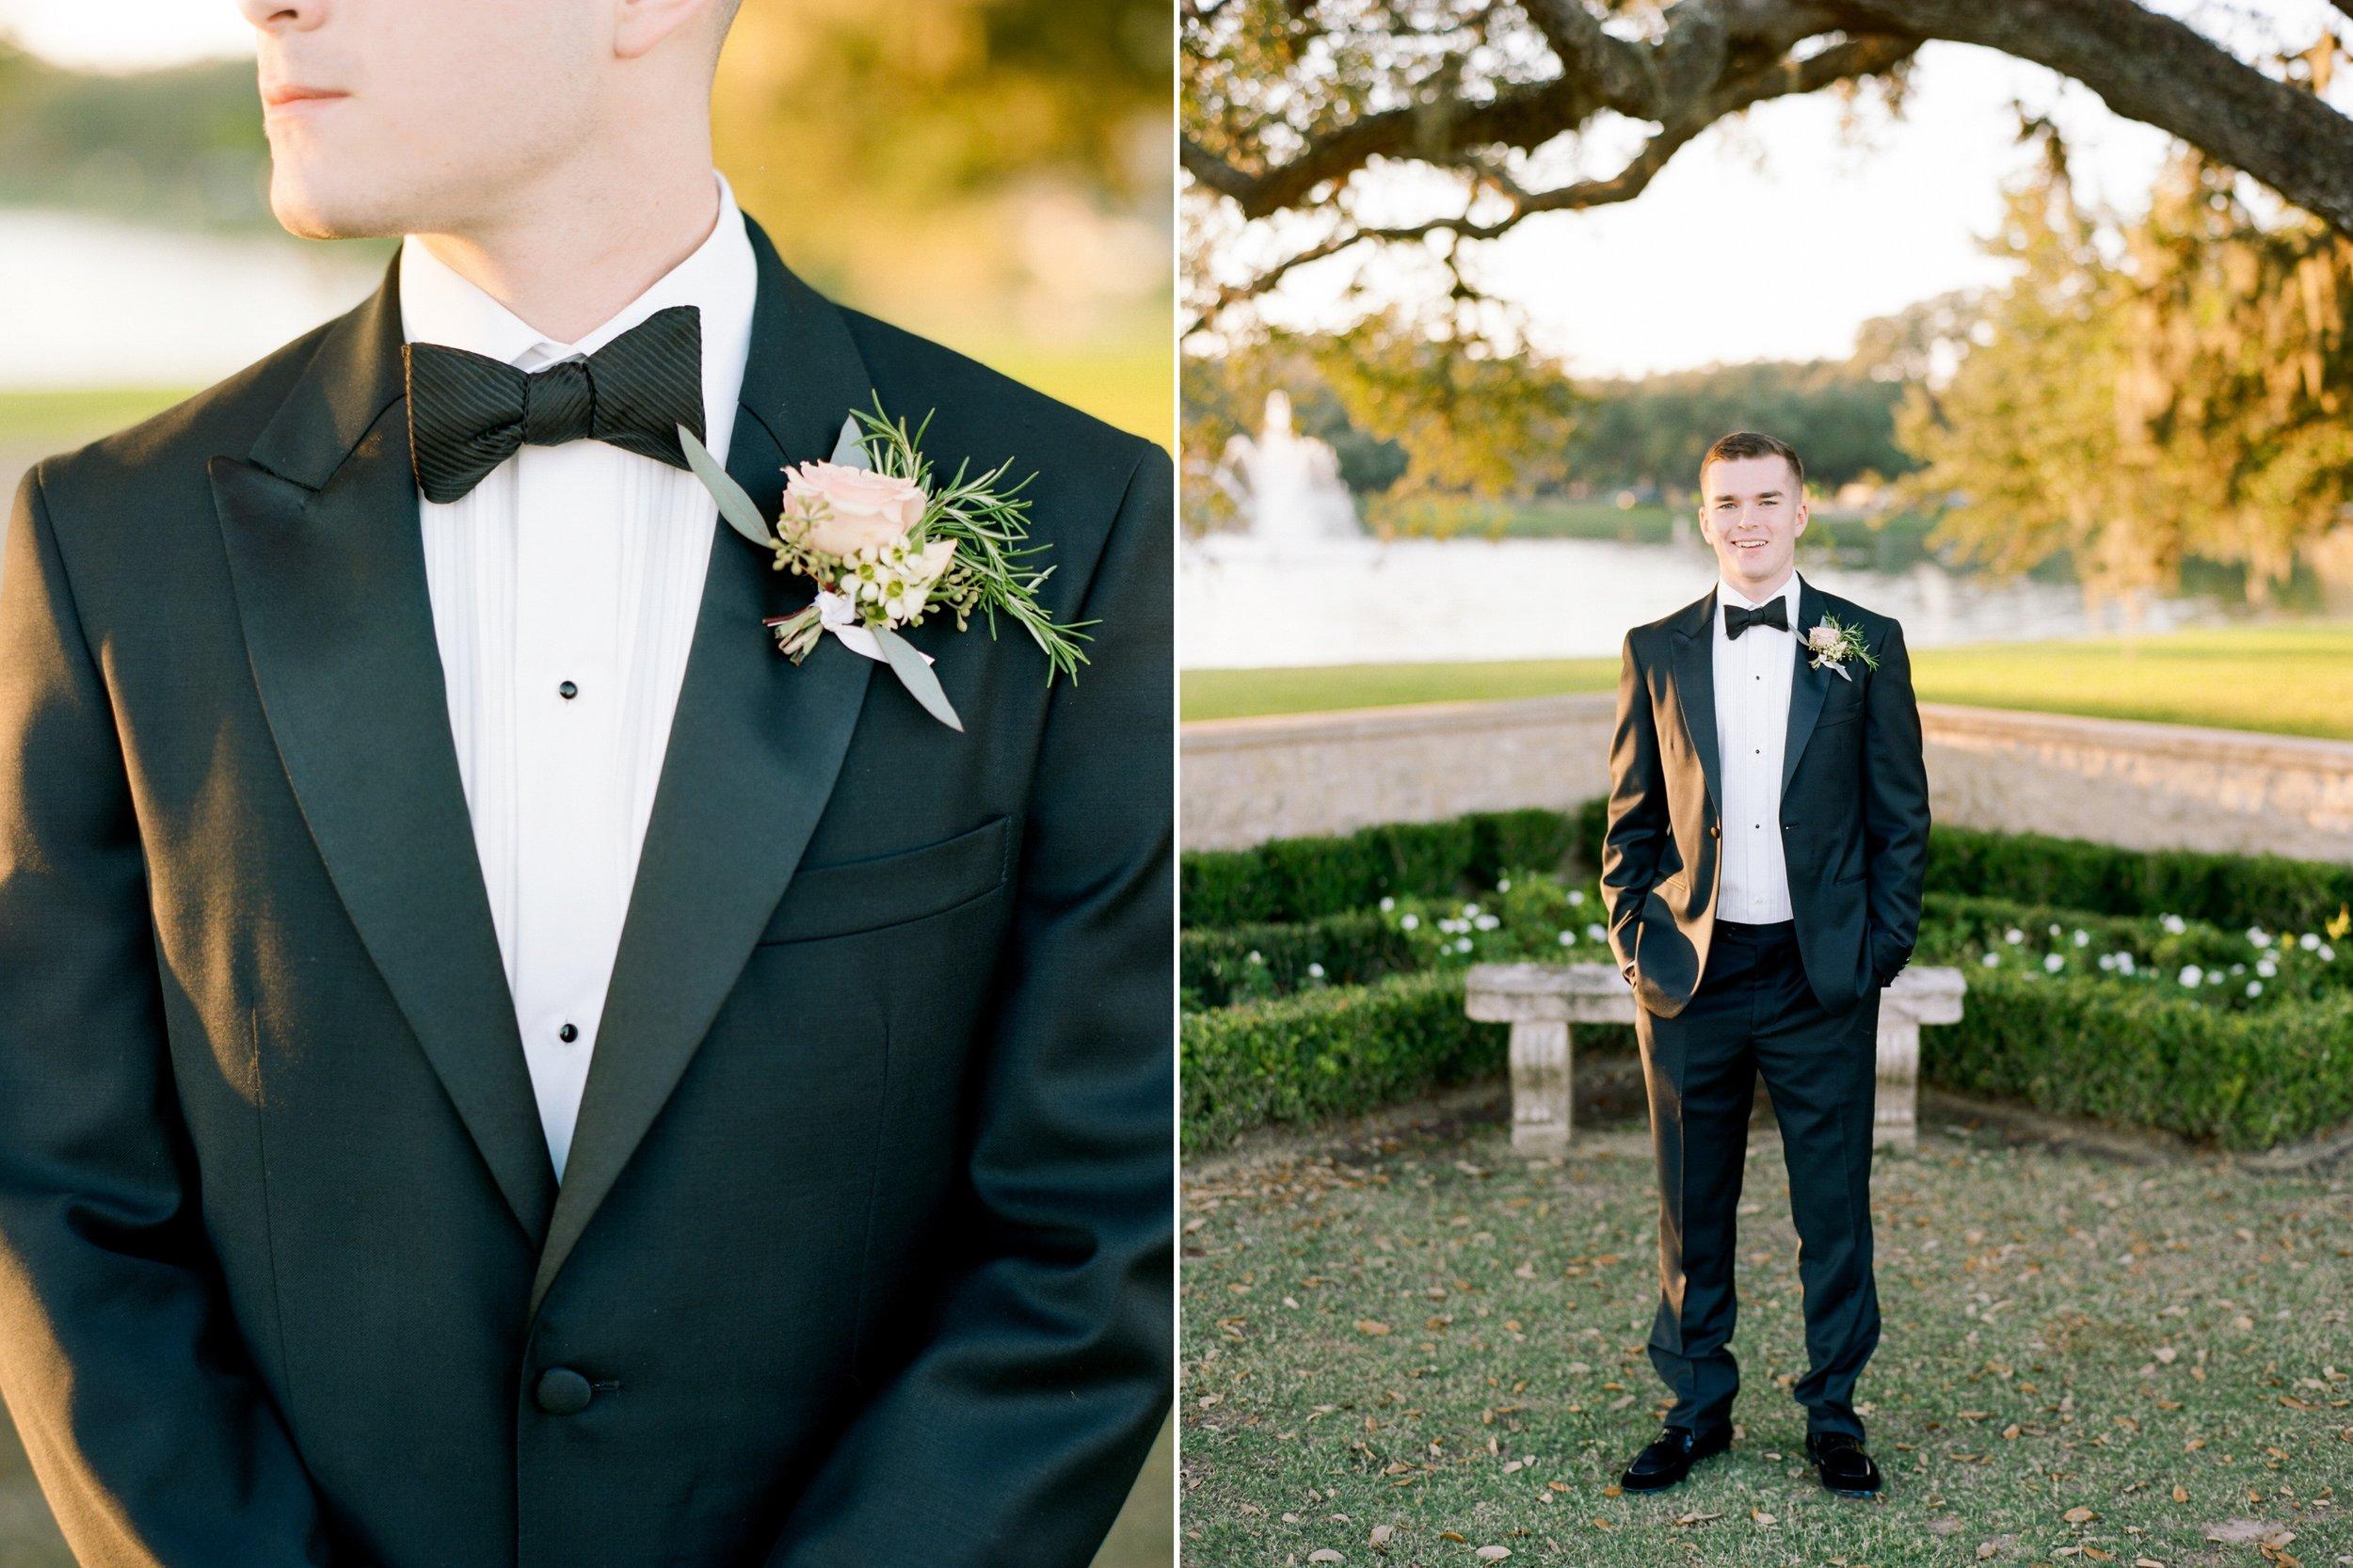 the-clubs-at-houston-oaks-wedding-houston-oaks-wedding-ceremony-houston-oaks-chapel-belle-of-the-ball-dana-fernandez-photography-houston-wedding-photographer-luxury-film-fine-art-117.jpg